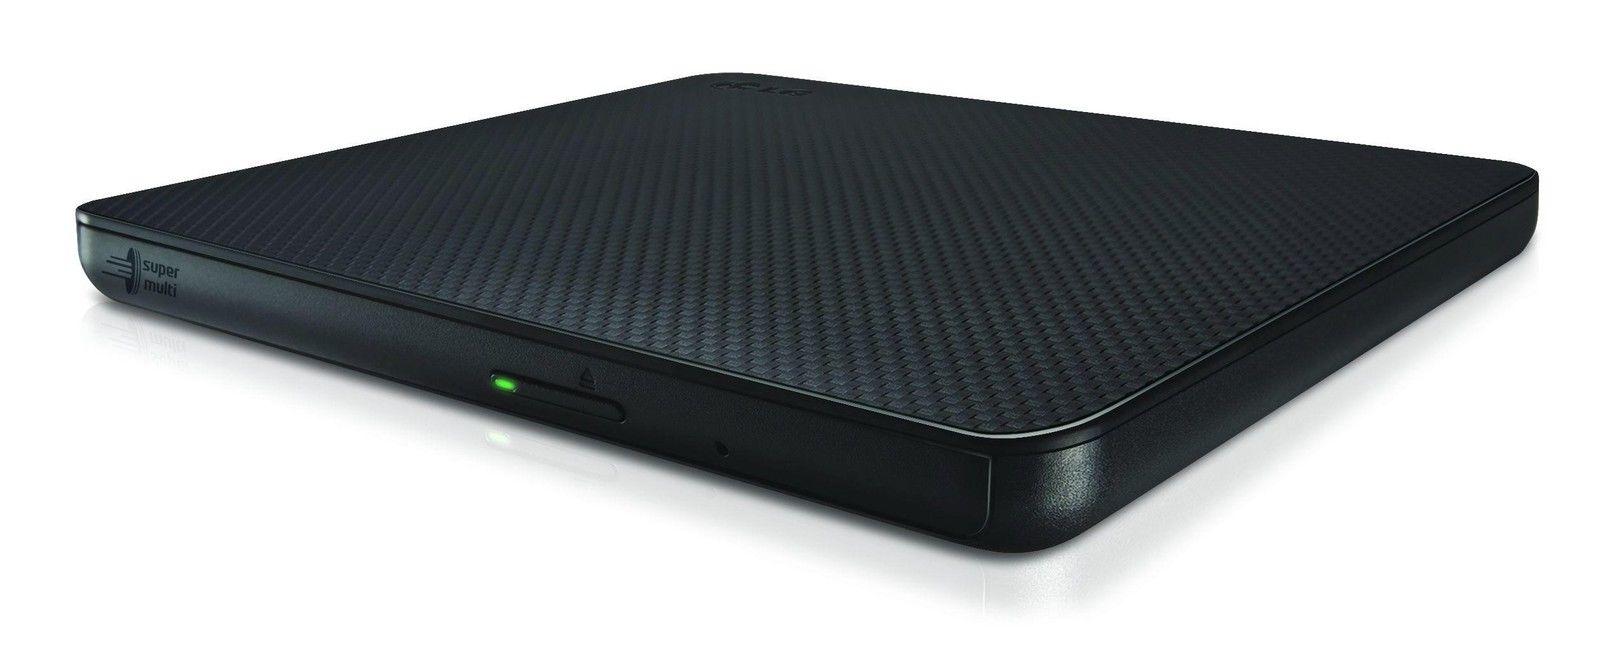 Hitachi-LG Data Storage GP60NB60 (GP60NB60) - Achat / Vente Graveur sur Cybertek.fr - 0